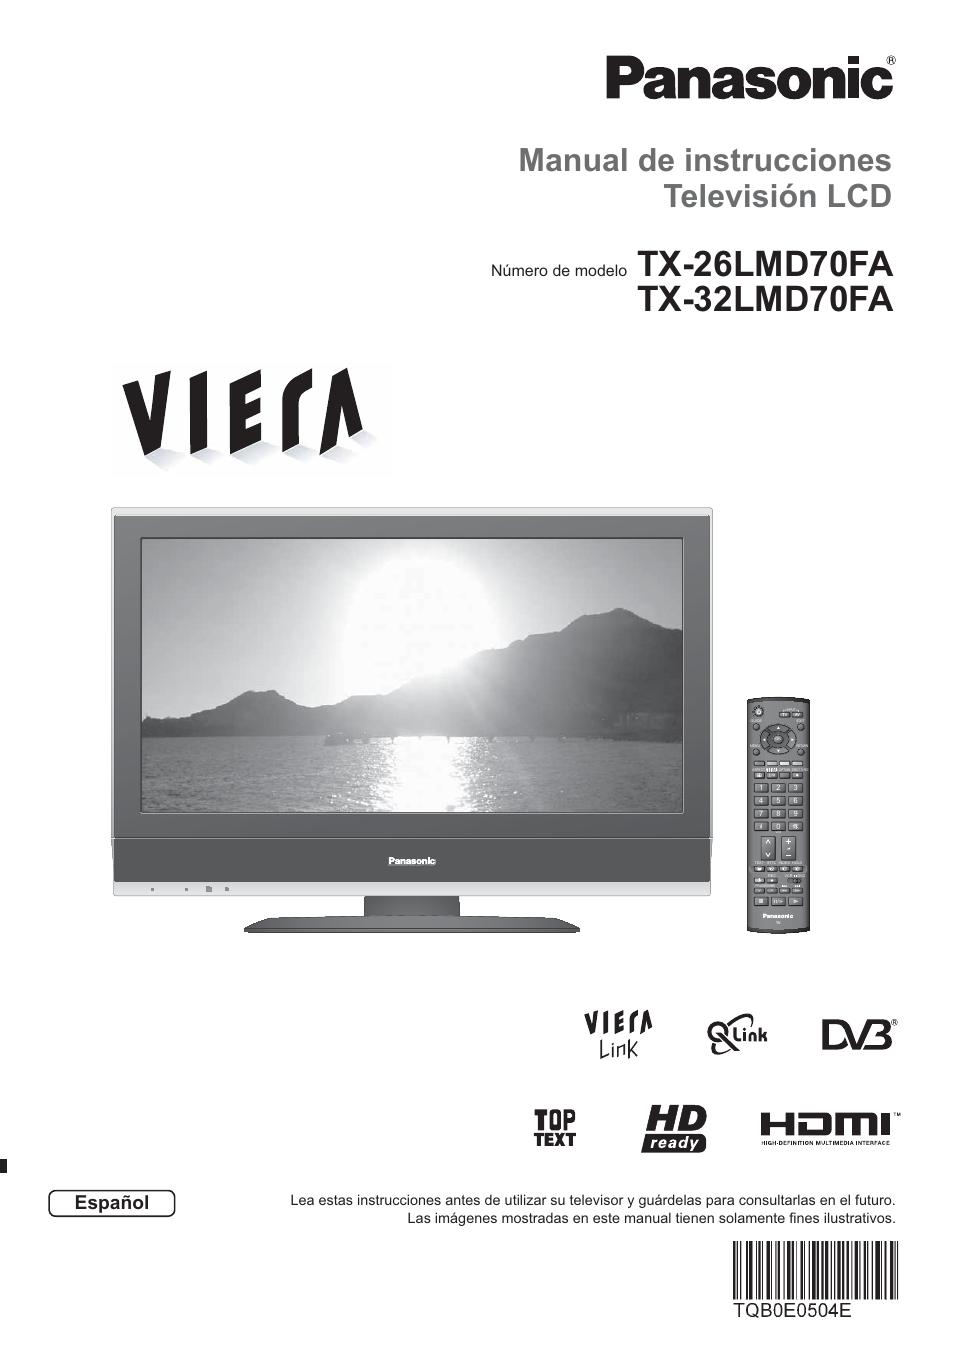 panasonic tx32lmd70fa manual del usuario p ginas 44 rh pdfmanuales com Panasonic Viera Back Panel Panasonic Viera TV Troubleshooting